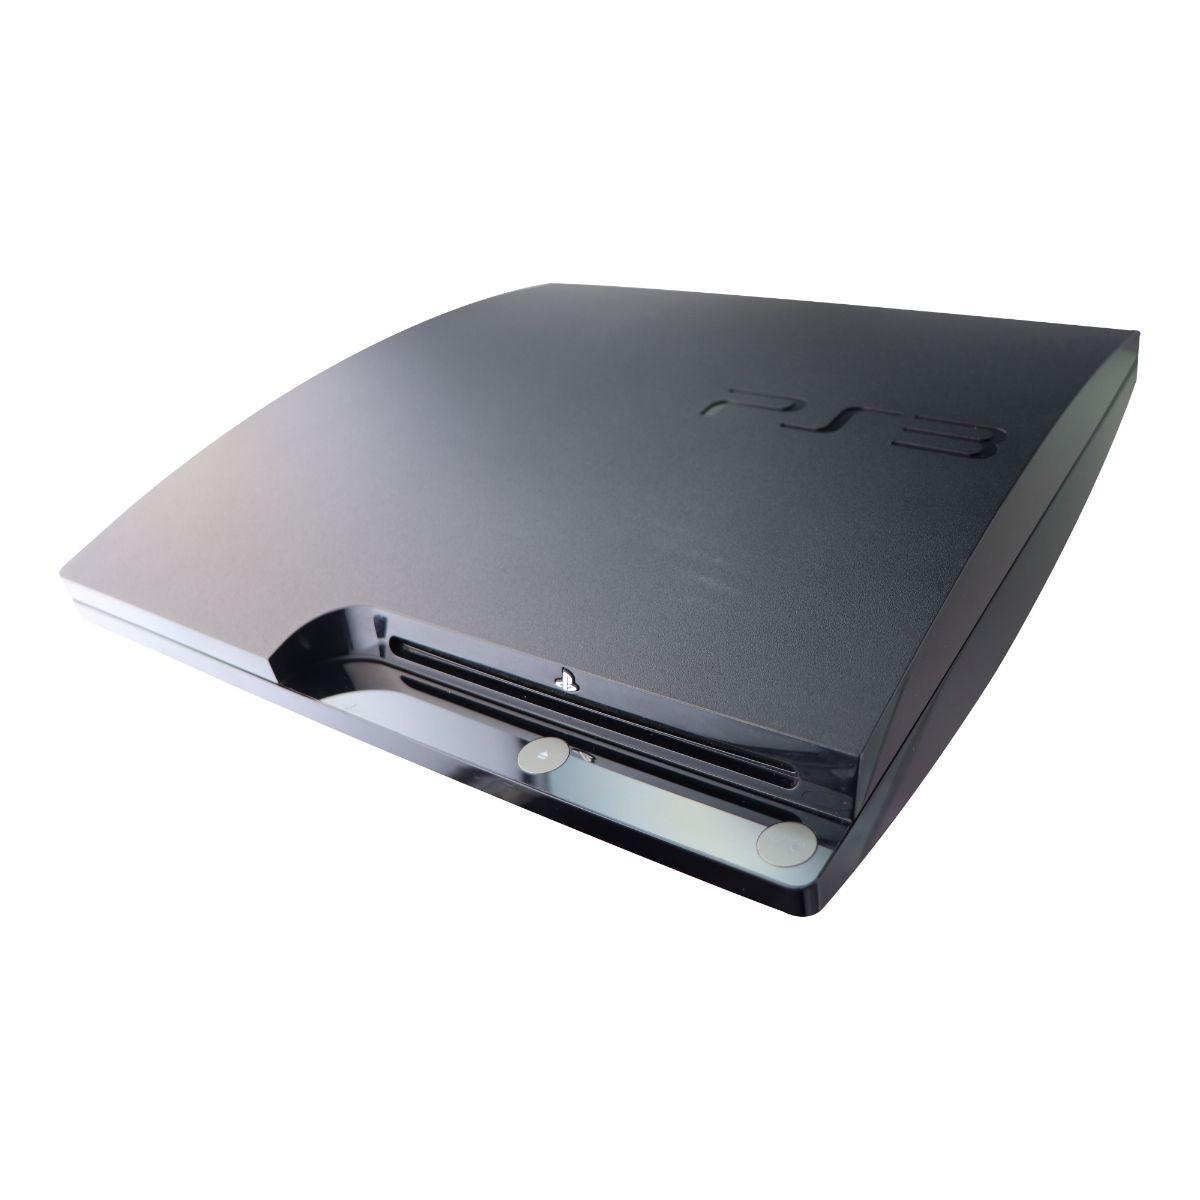 Sony PlayStation 3 Slim (250GB Version) Gaming Console - Black